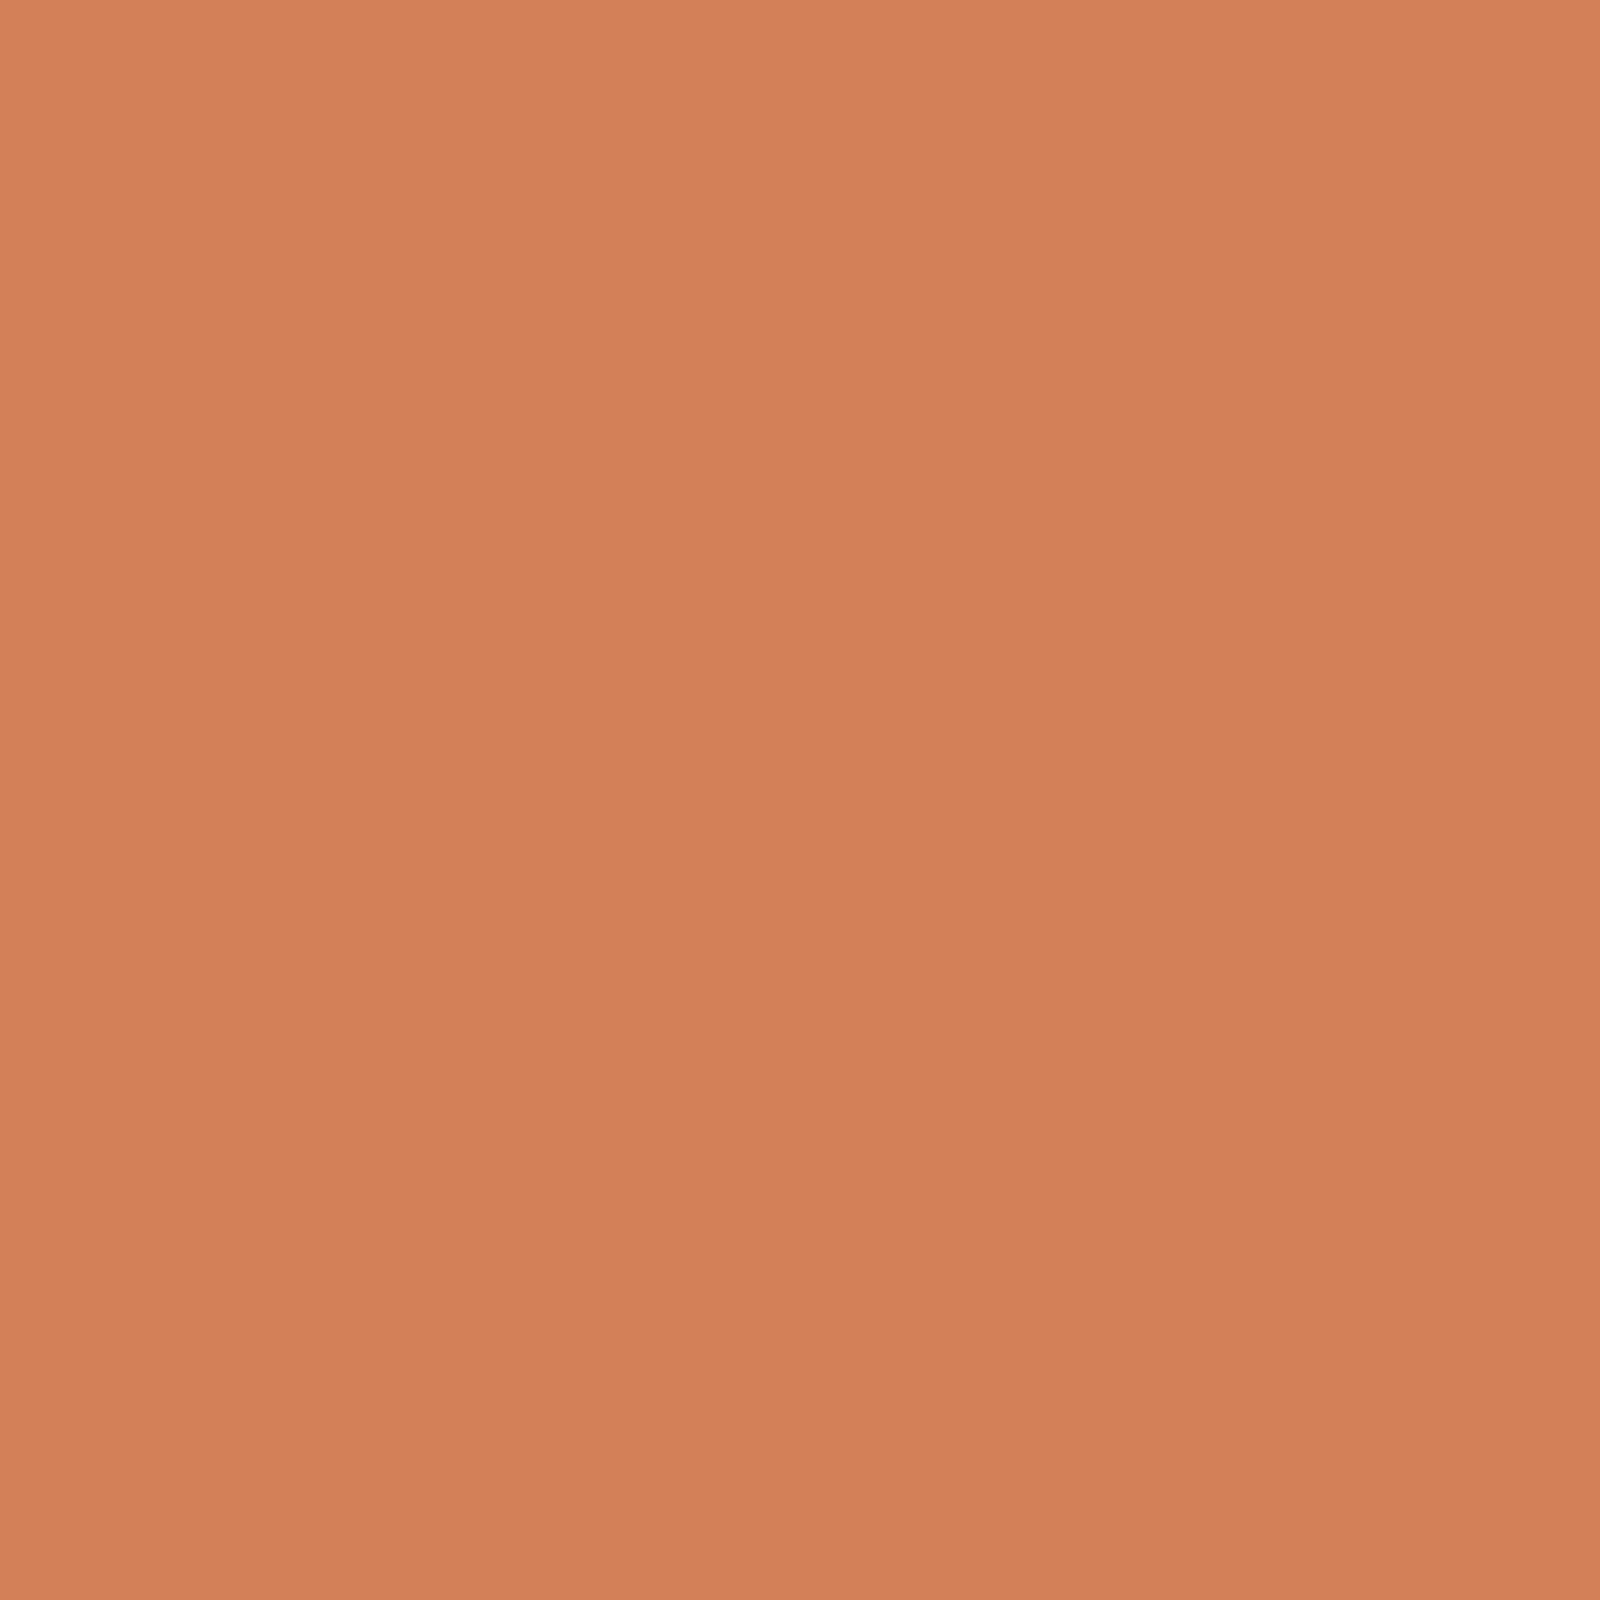 Cosmo Floss - 128 Yellow Ocher